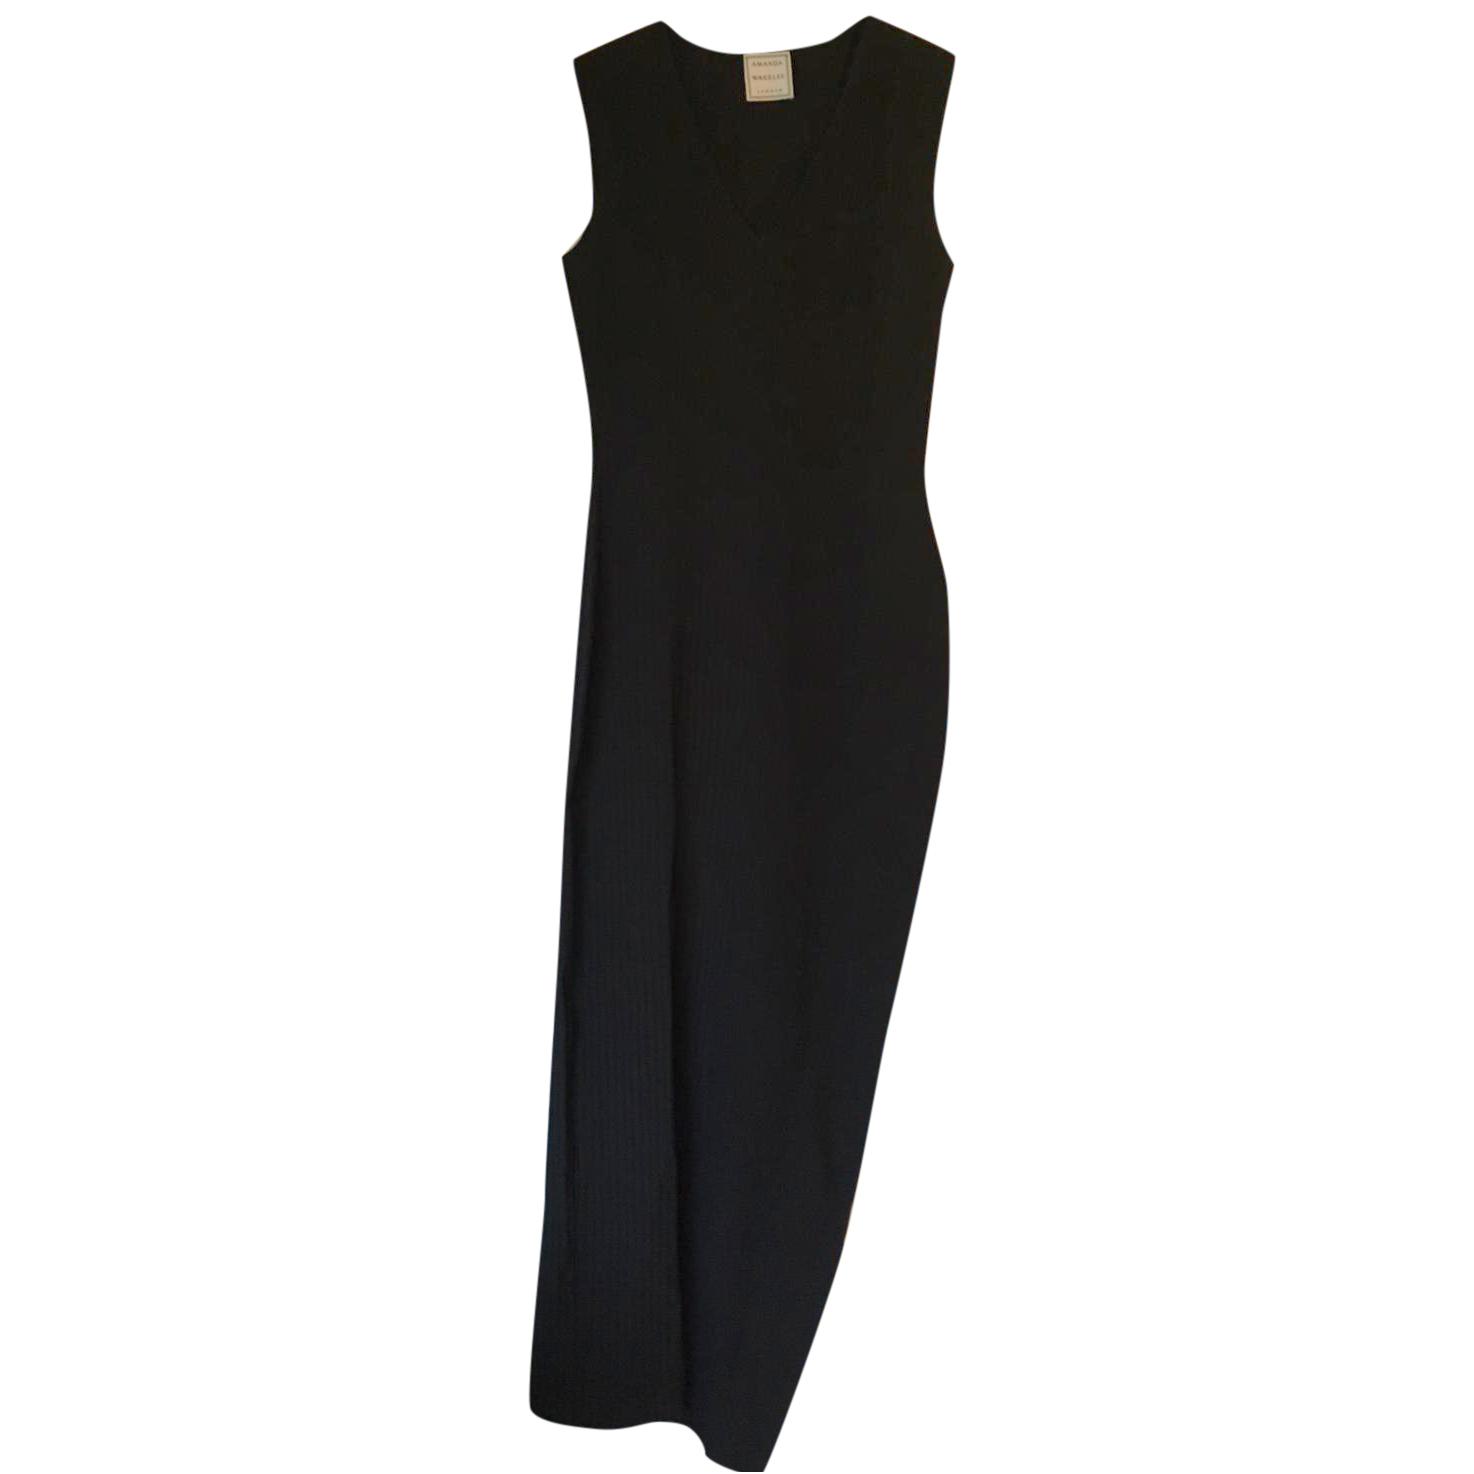 Amanda Wakeley Black Ribbed Dress